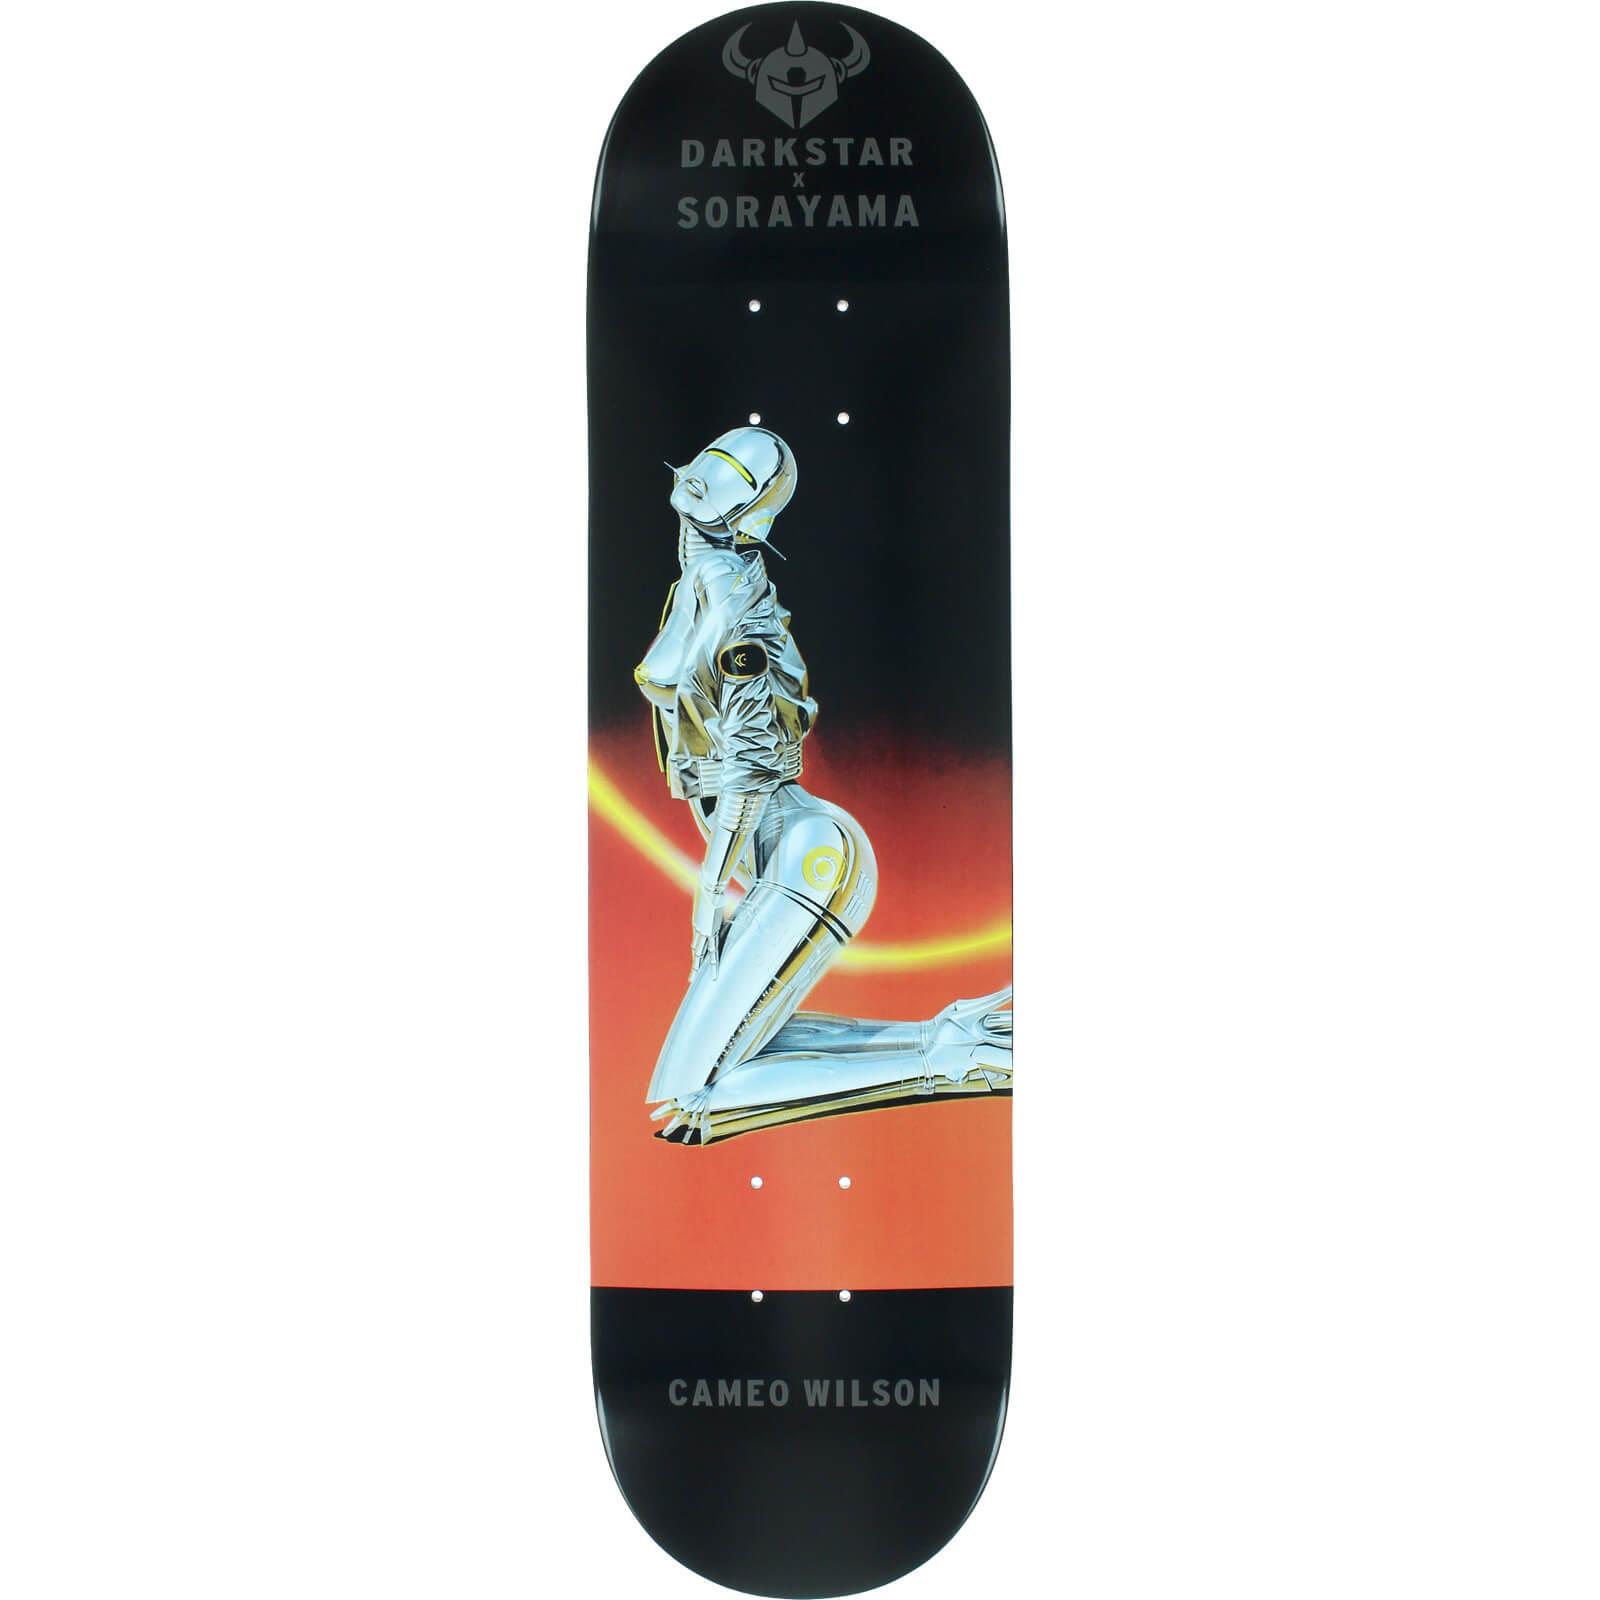 Darkstar Skateboards Cameo Wilson Resin 7 Sorayama